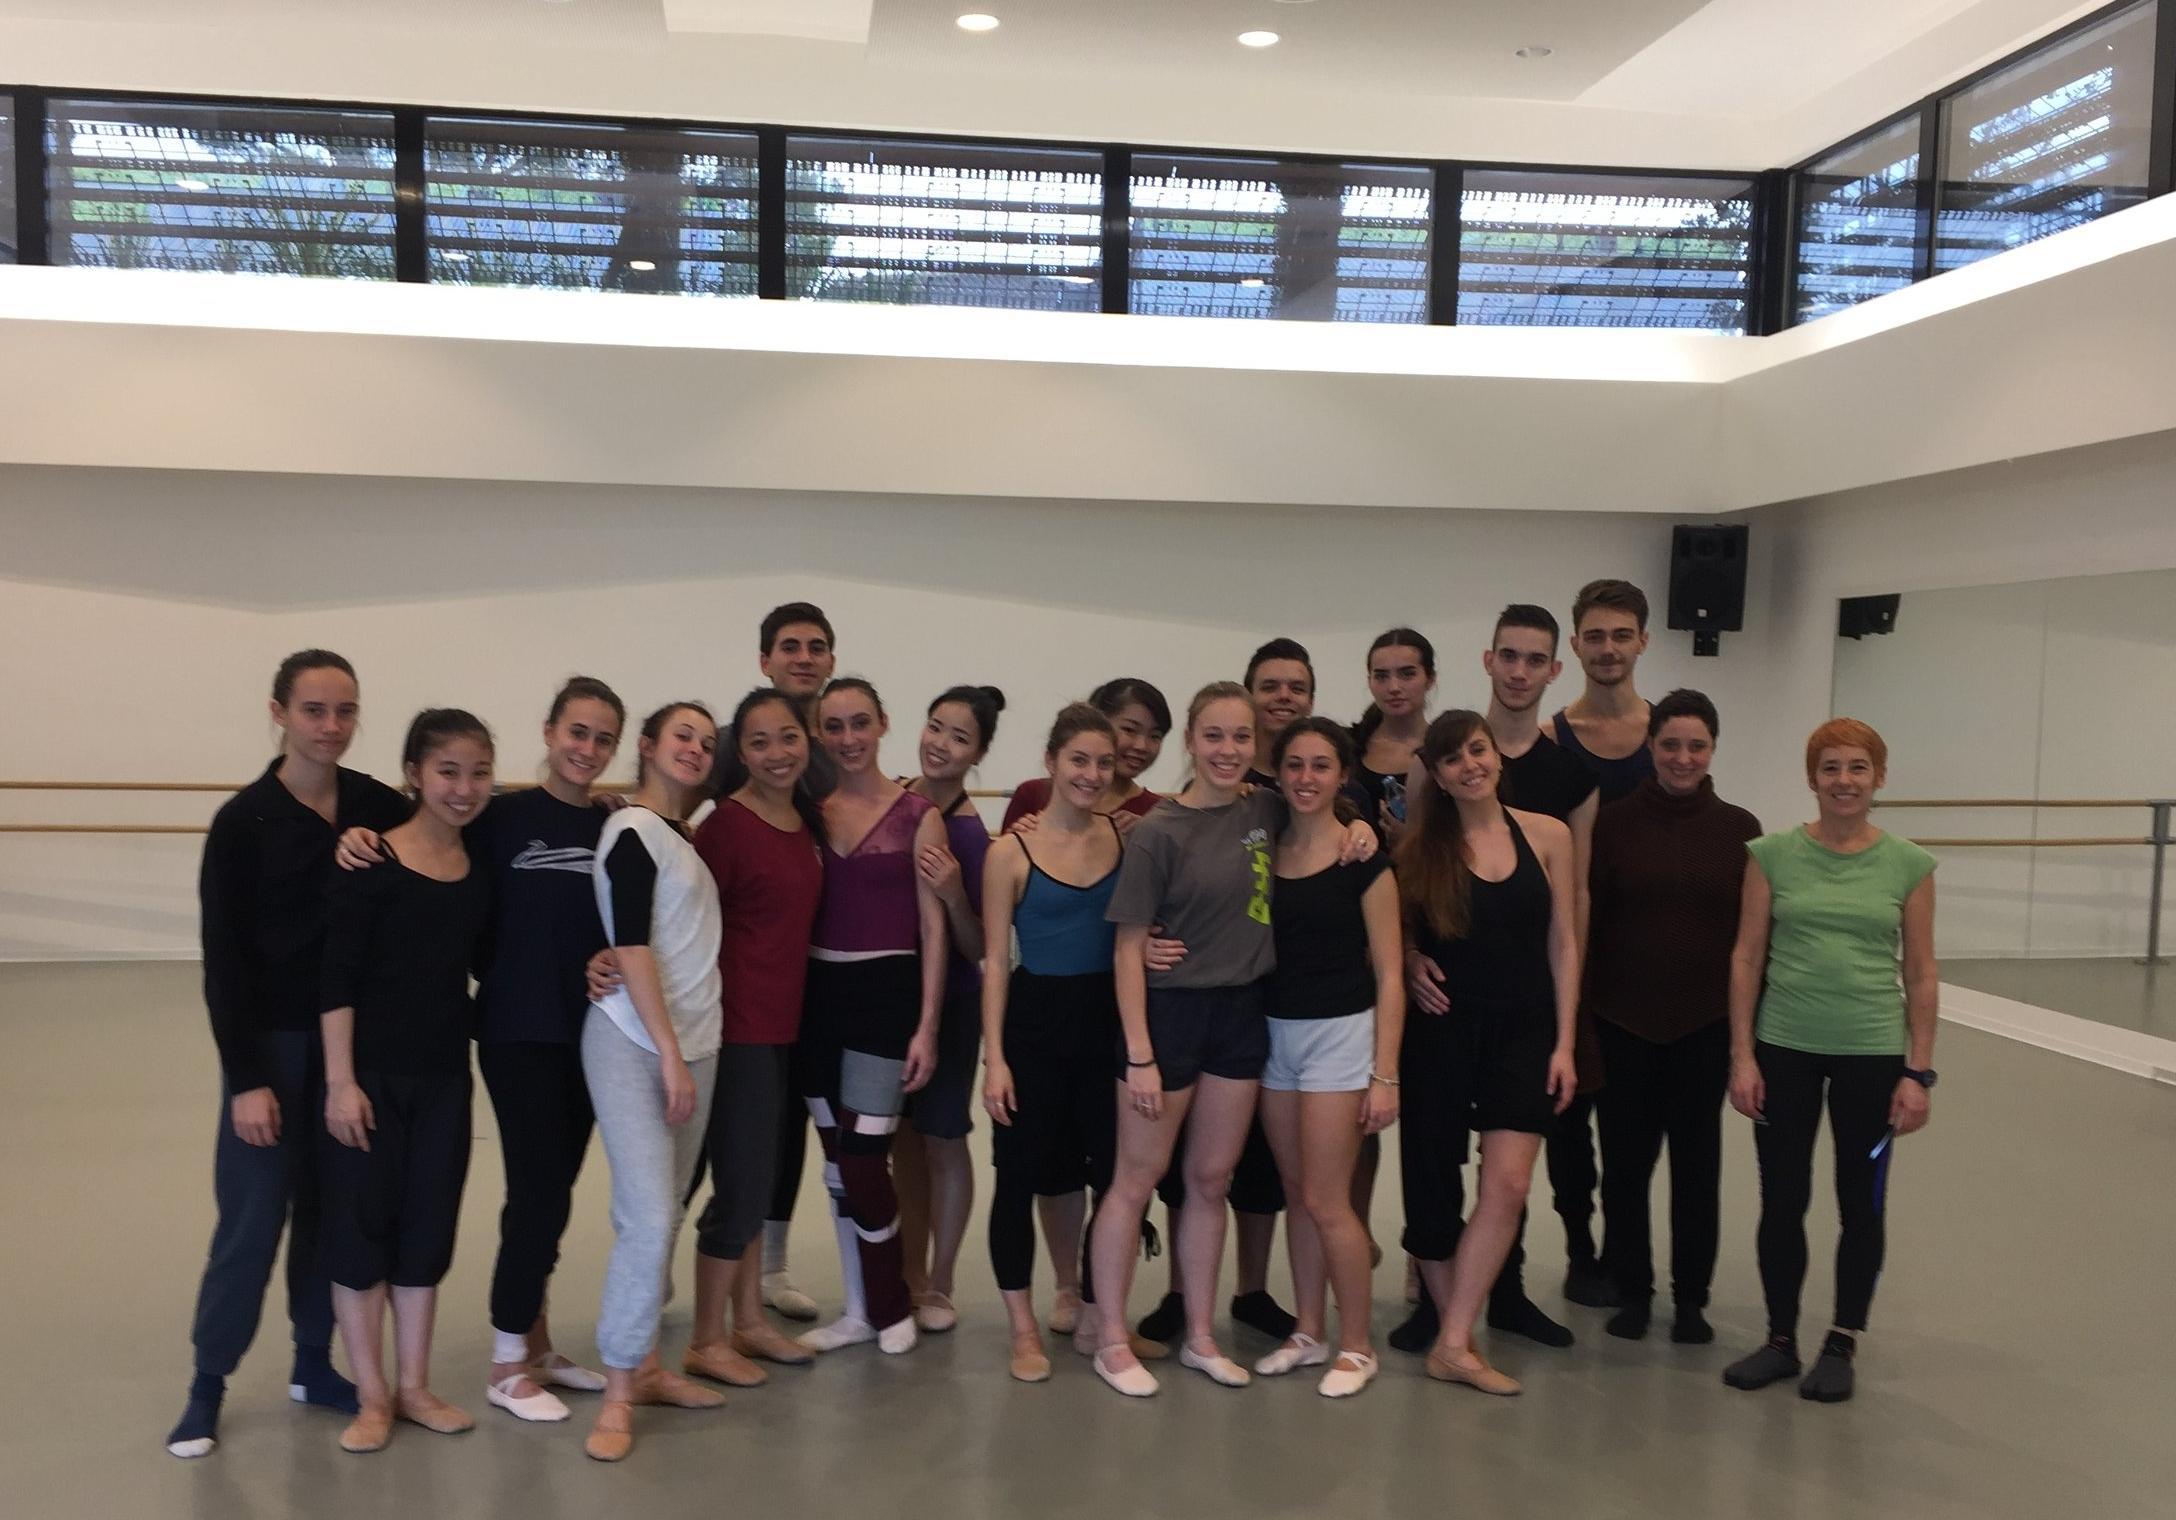 Classe de DNSP2 avec Joelle Donati et Silvia Bidegain (à droite)